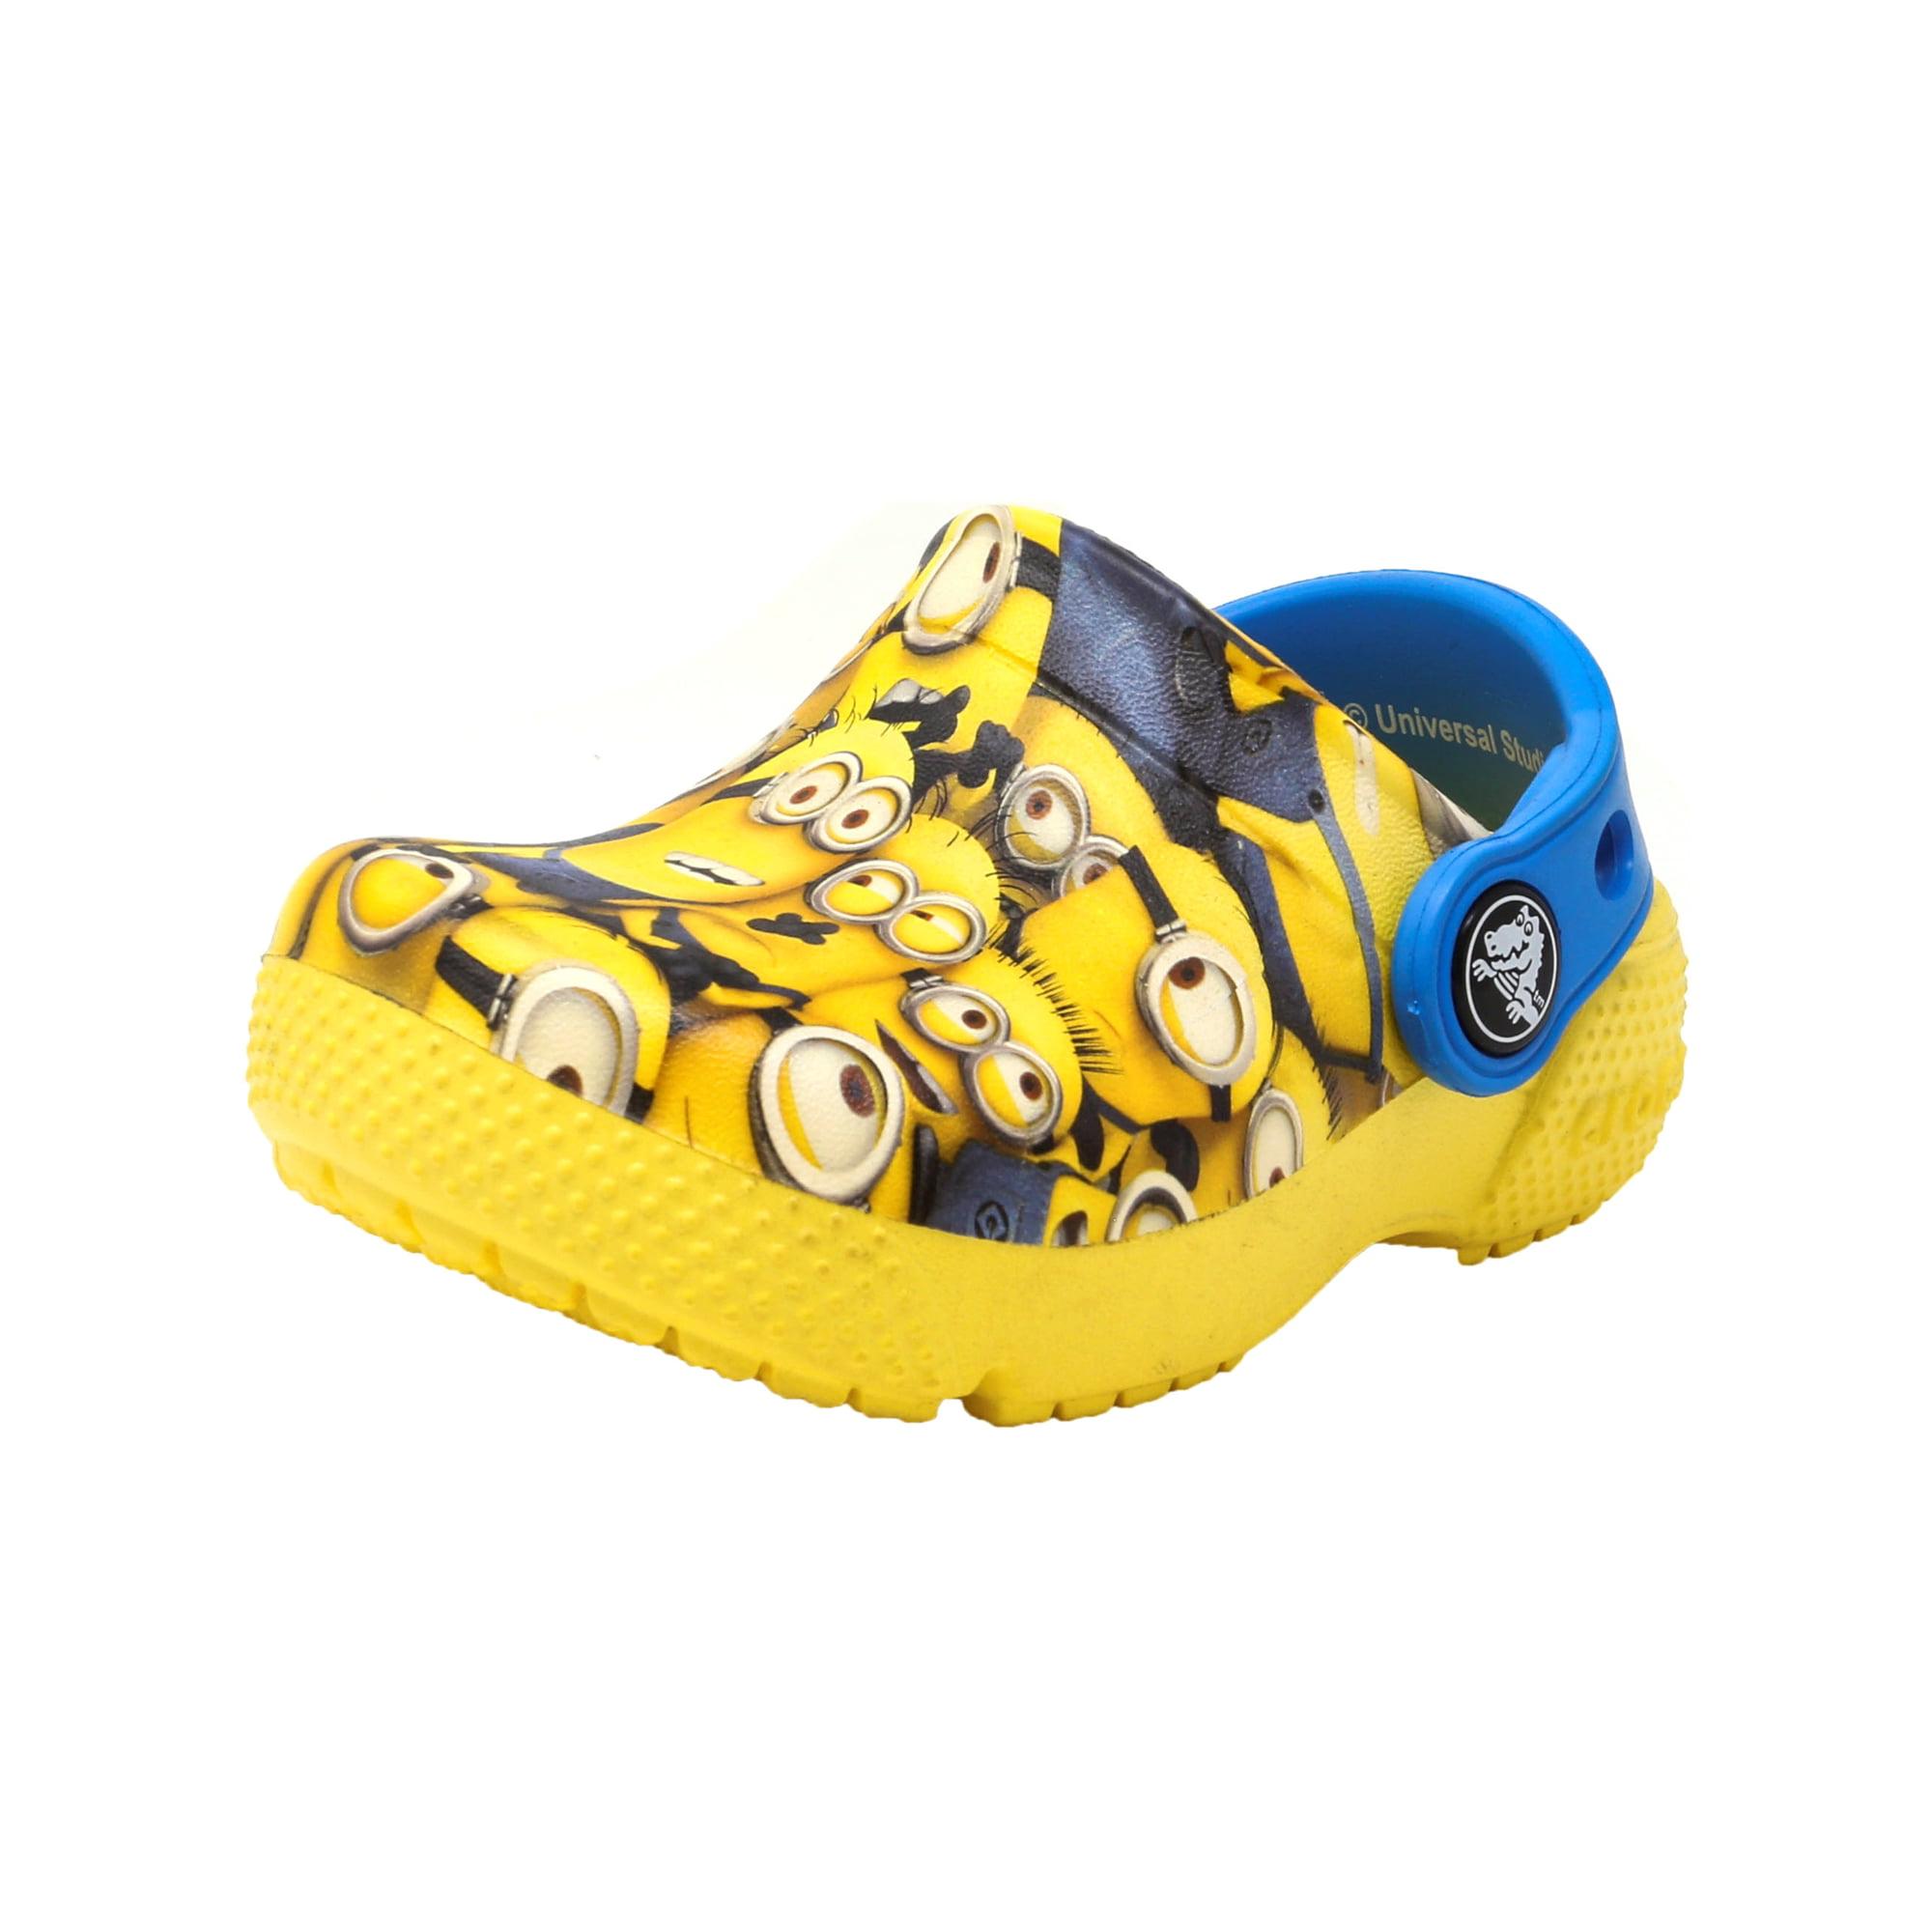 bcf7d605cc608e Buy Crocs Crocksfunlab Minions Graphic Sunshine Ankle-High Clogs ...